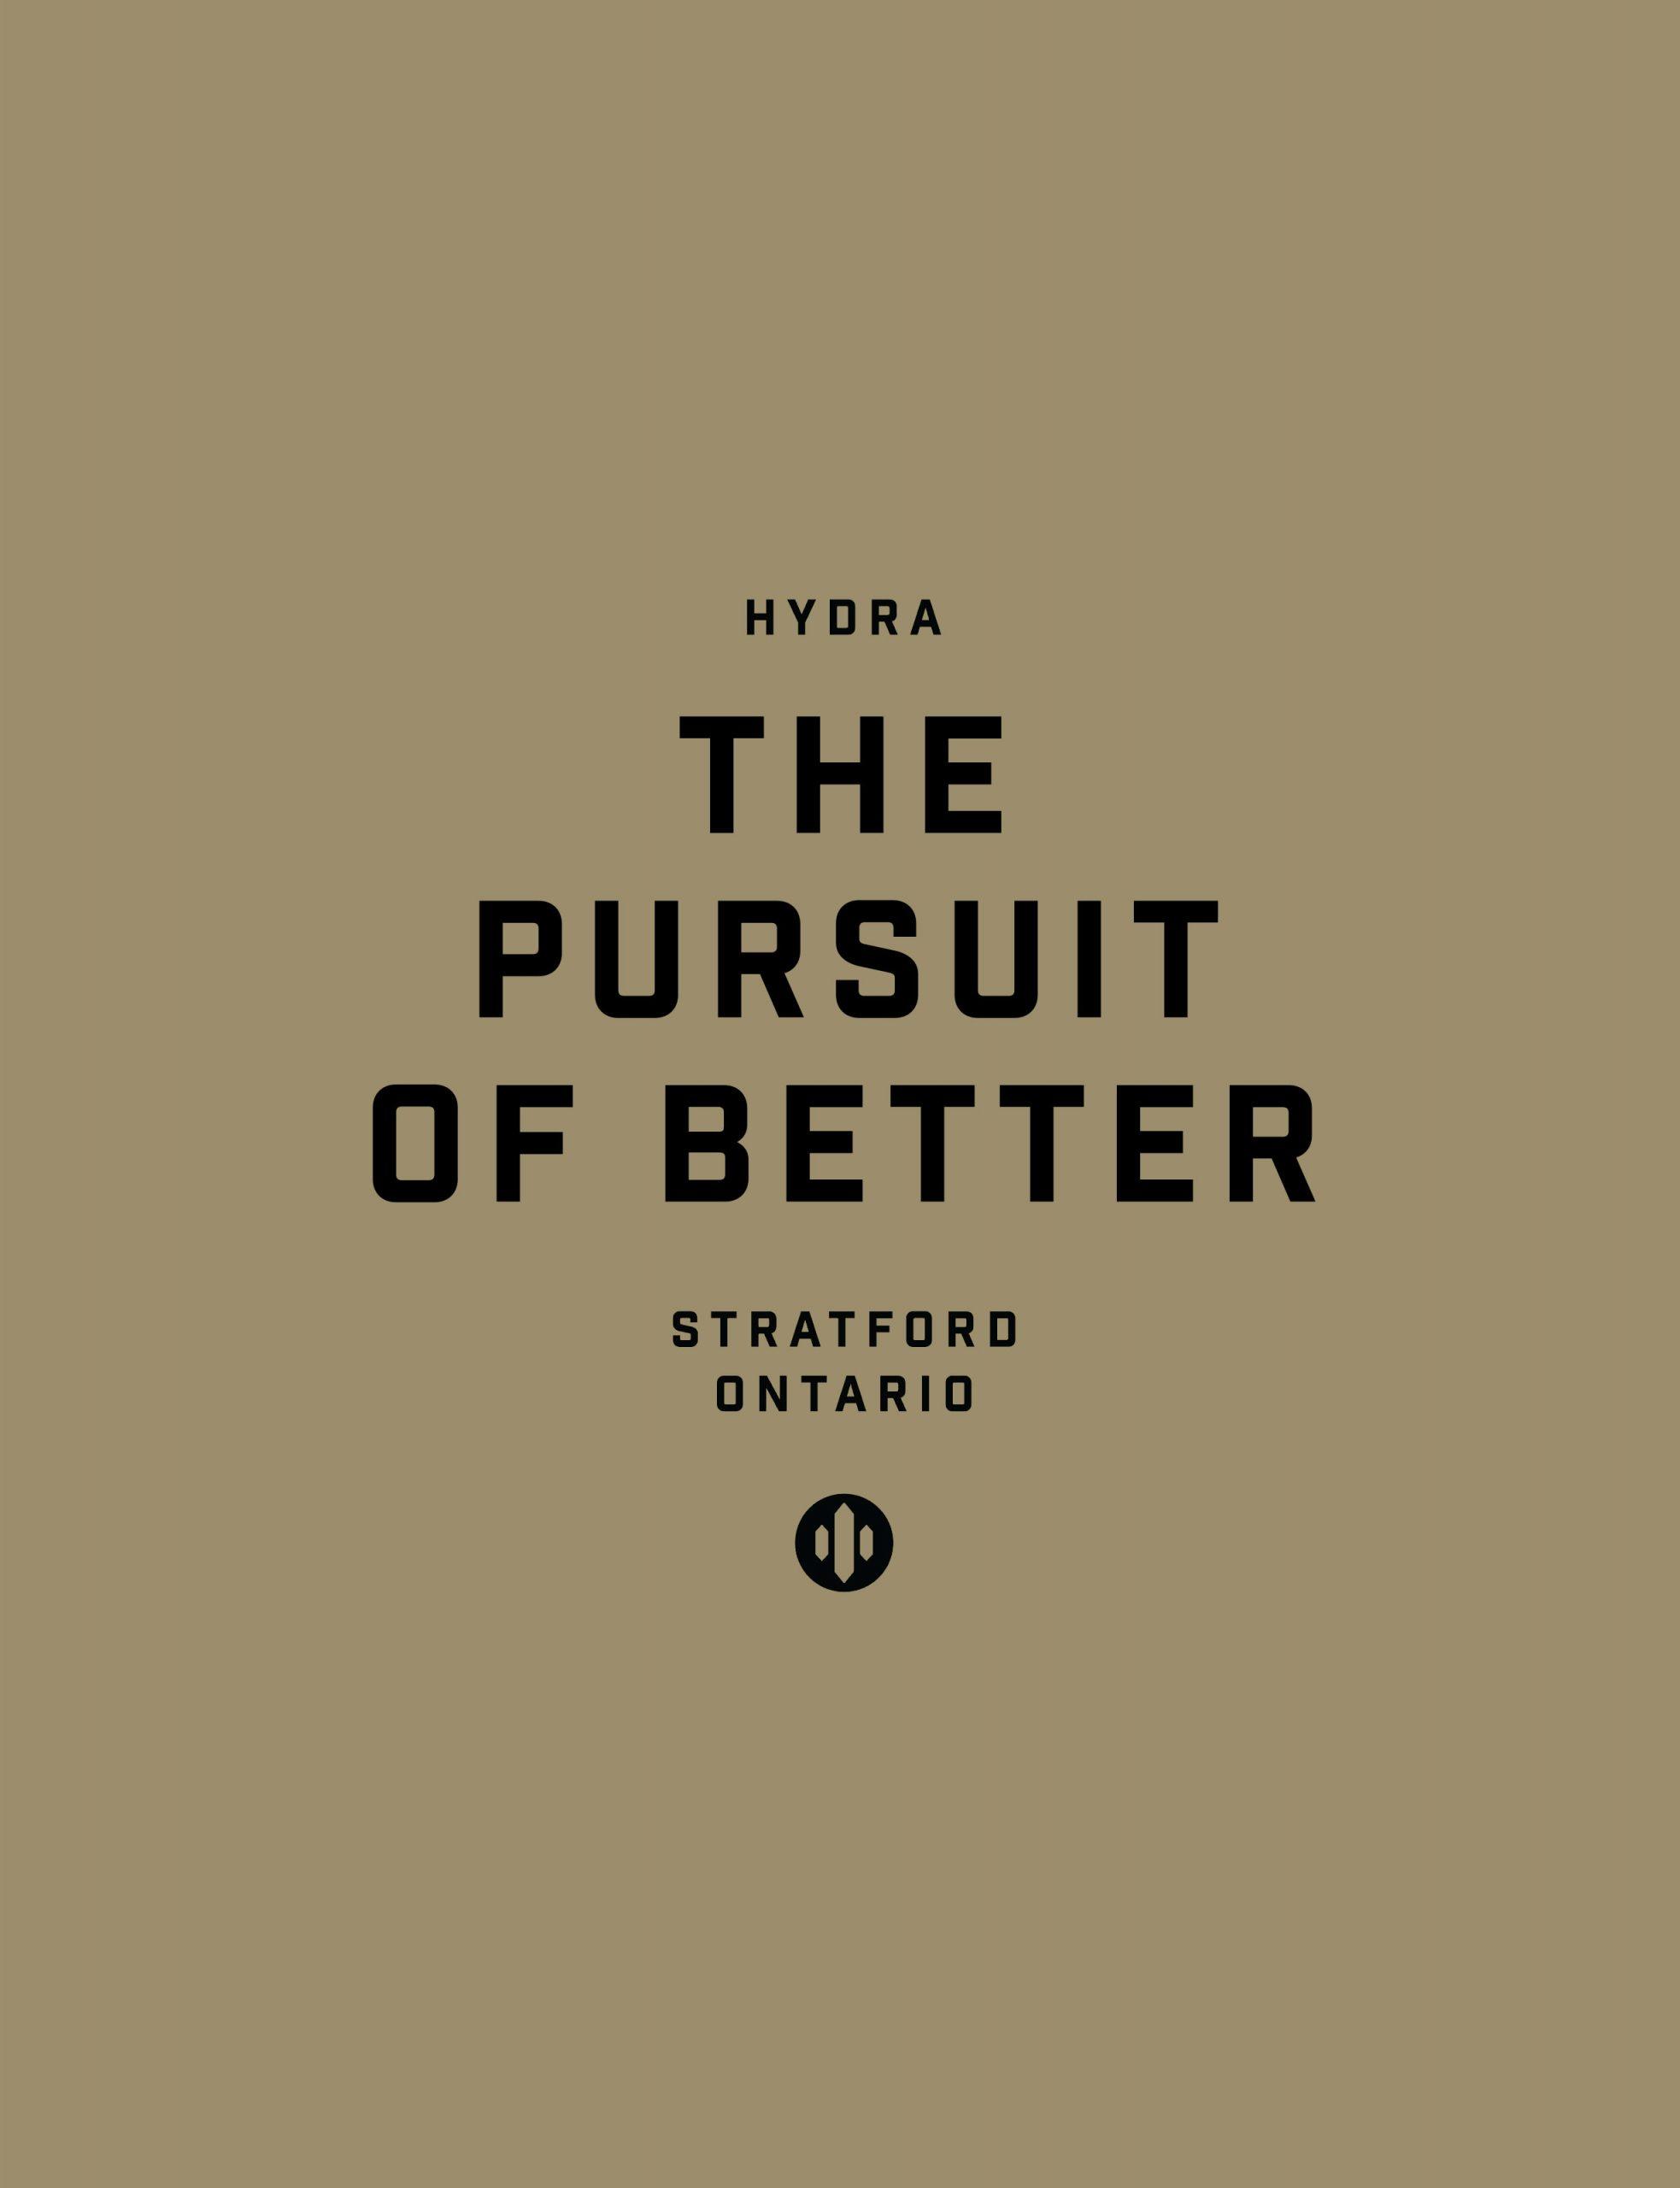 Hydra-Branding_Portfolio_Portrait_01